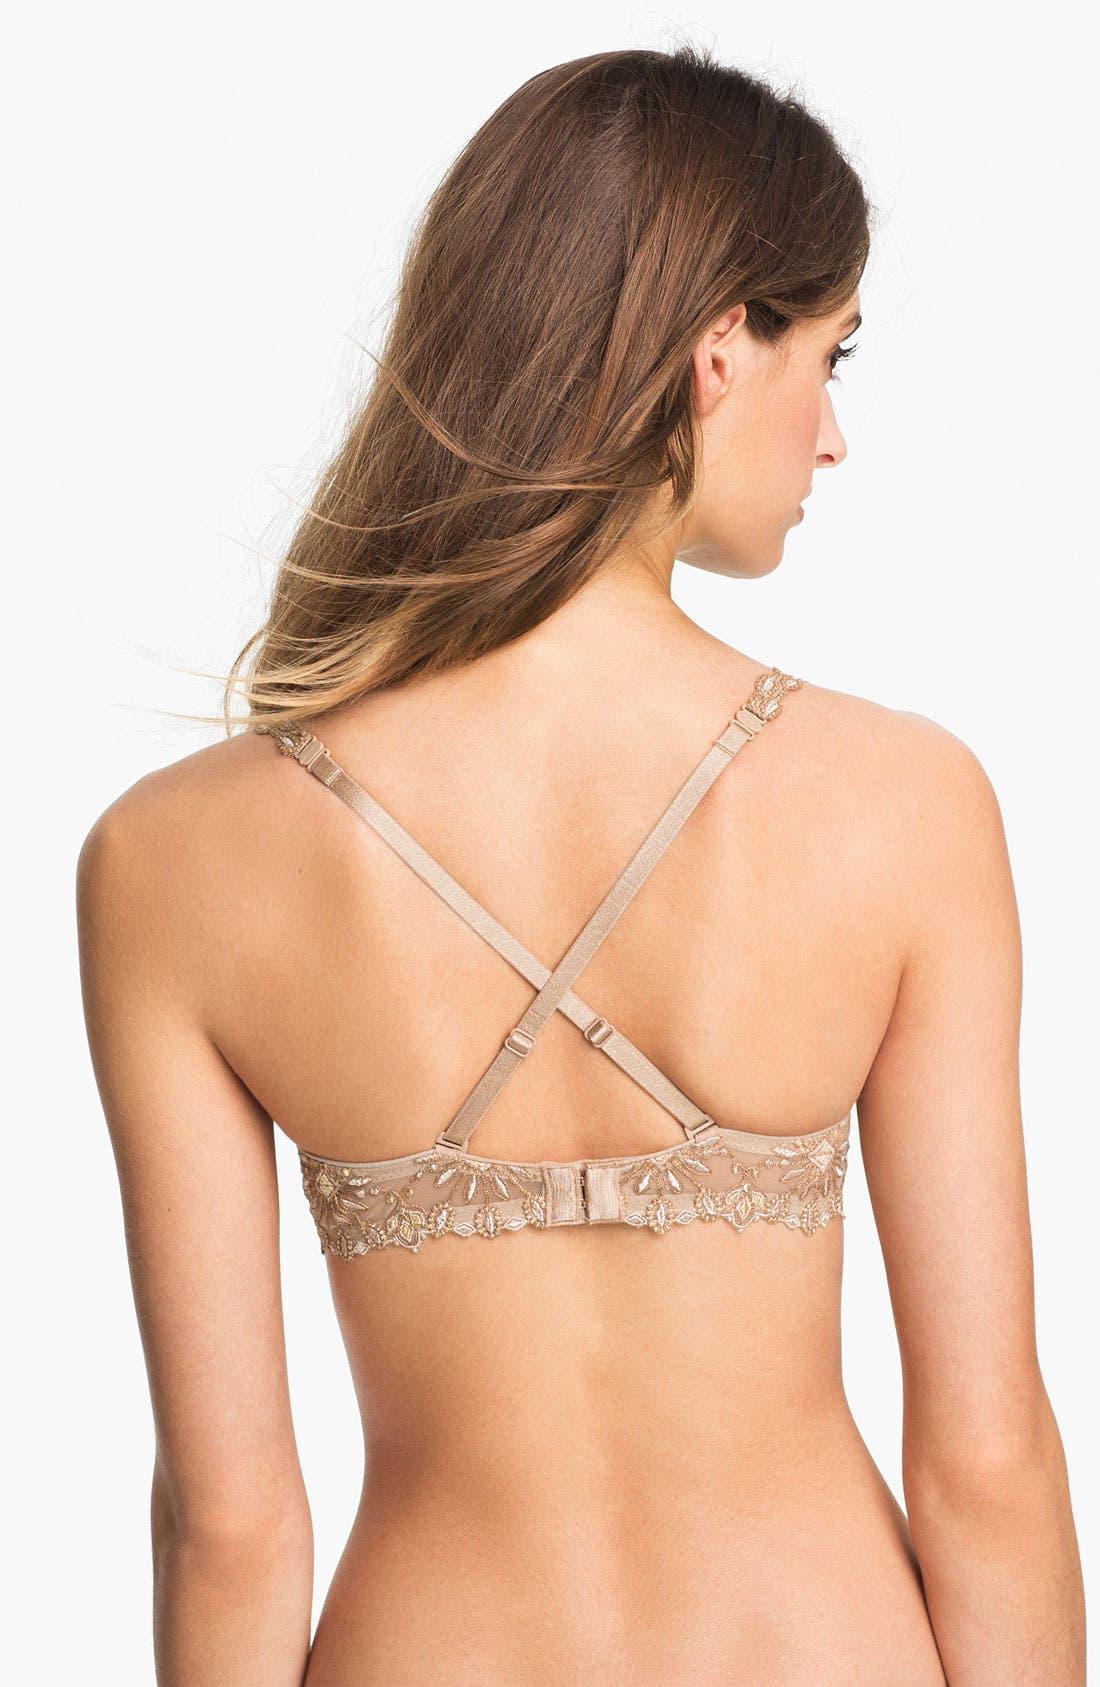 Alternate Image 3  - Chantelle Intimates 'Vendôme' Convertible Underwire T-Shirt Bra